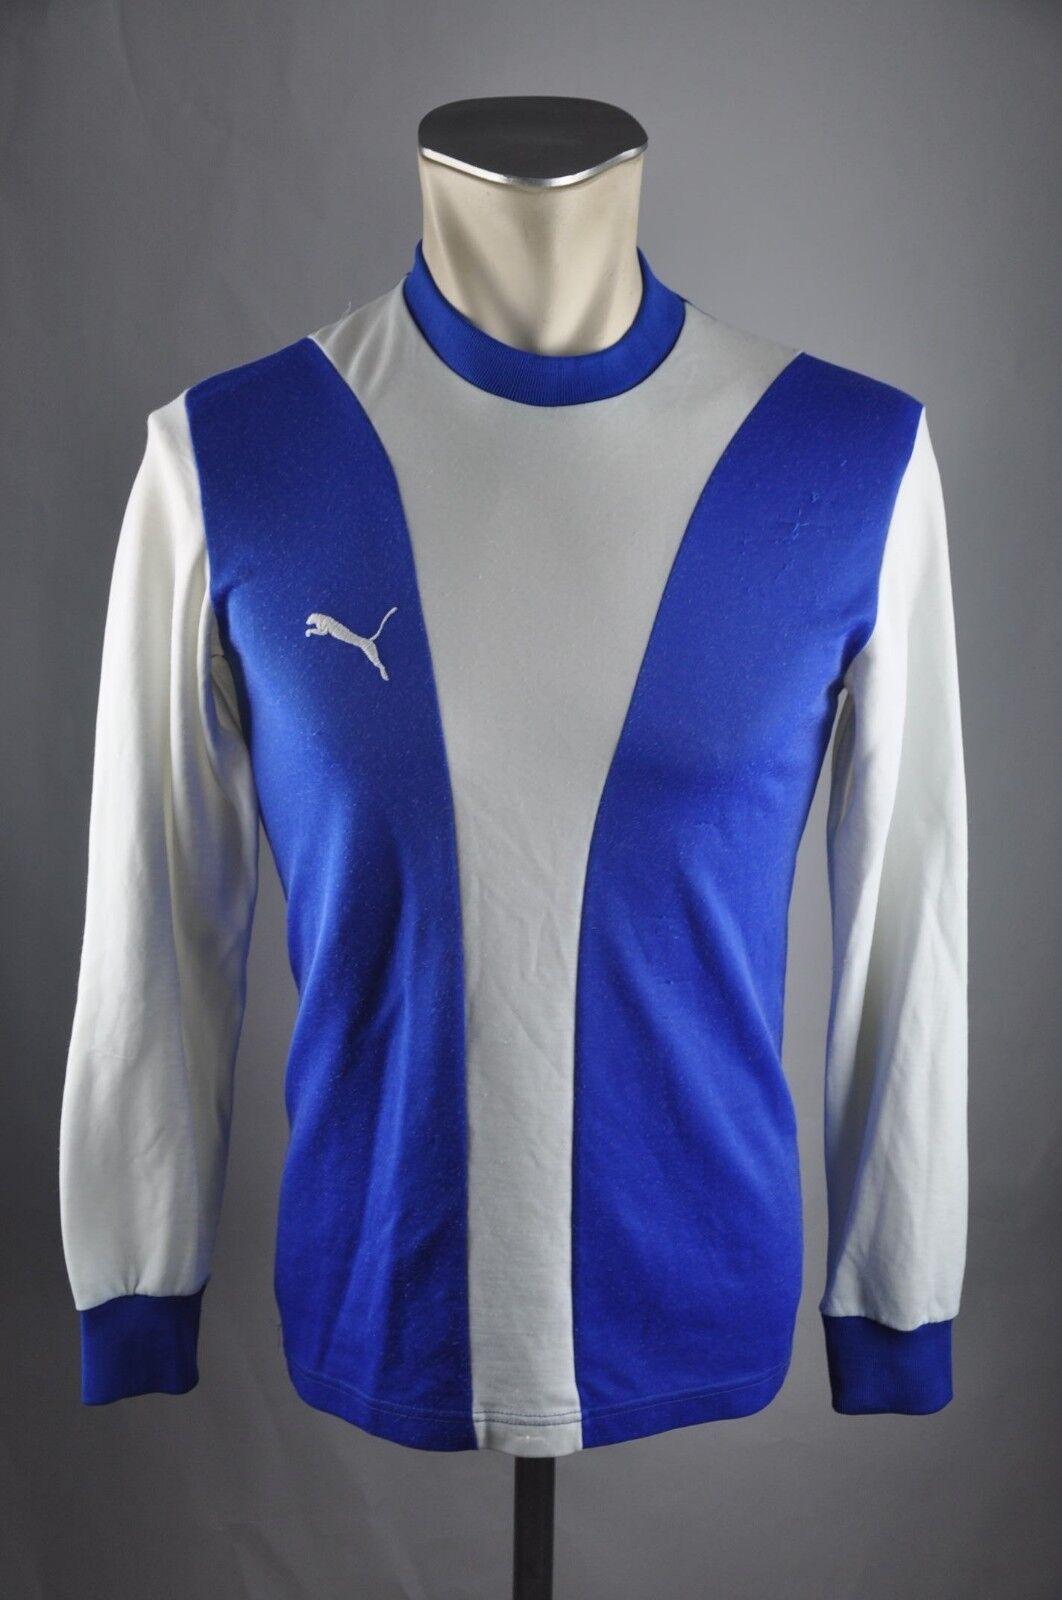 Puma vintage Shirt Rohling Trikot 80er Shirt  Gr. 3   S jersey 80s blue VA6